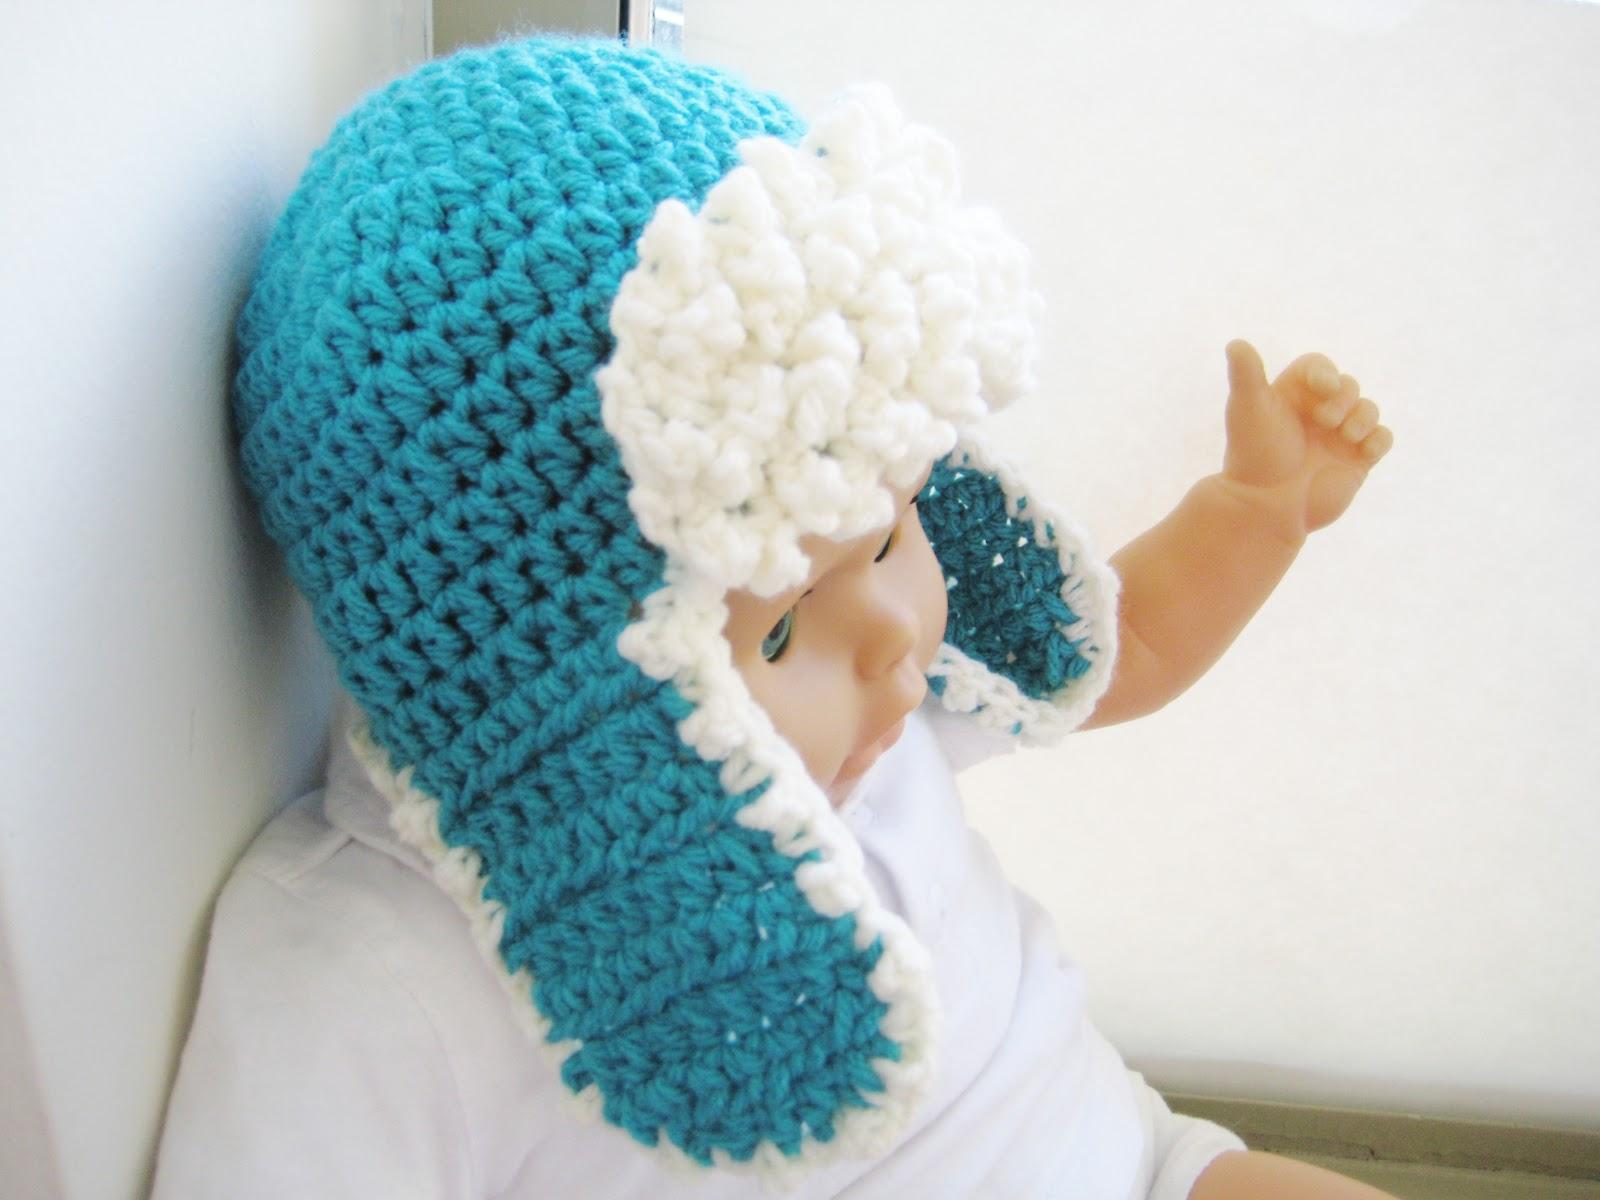 Crochet Newborn Aviator Hat Pattern : Crochet Dreamz: Aviator Hat Crochet Pattern, Newborn Baby ...